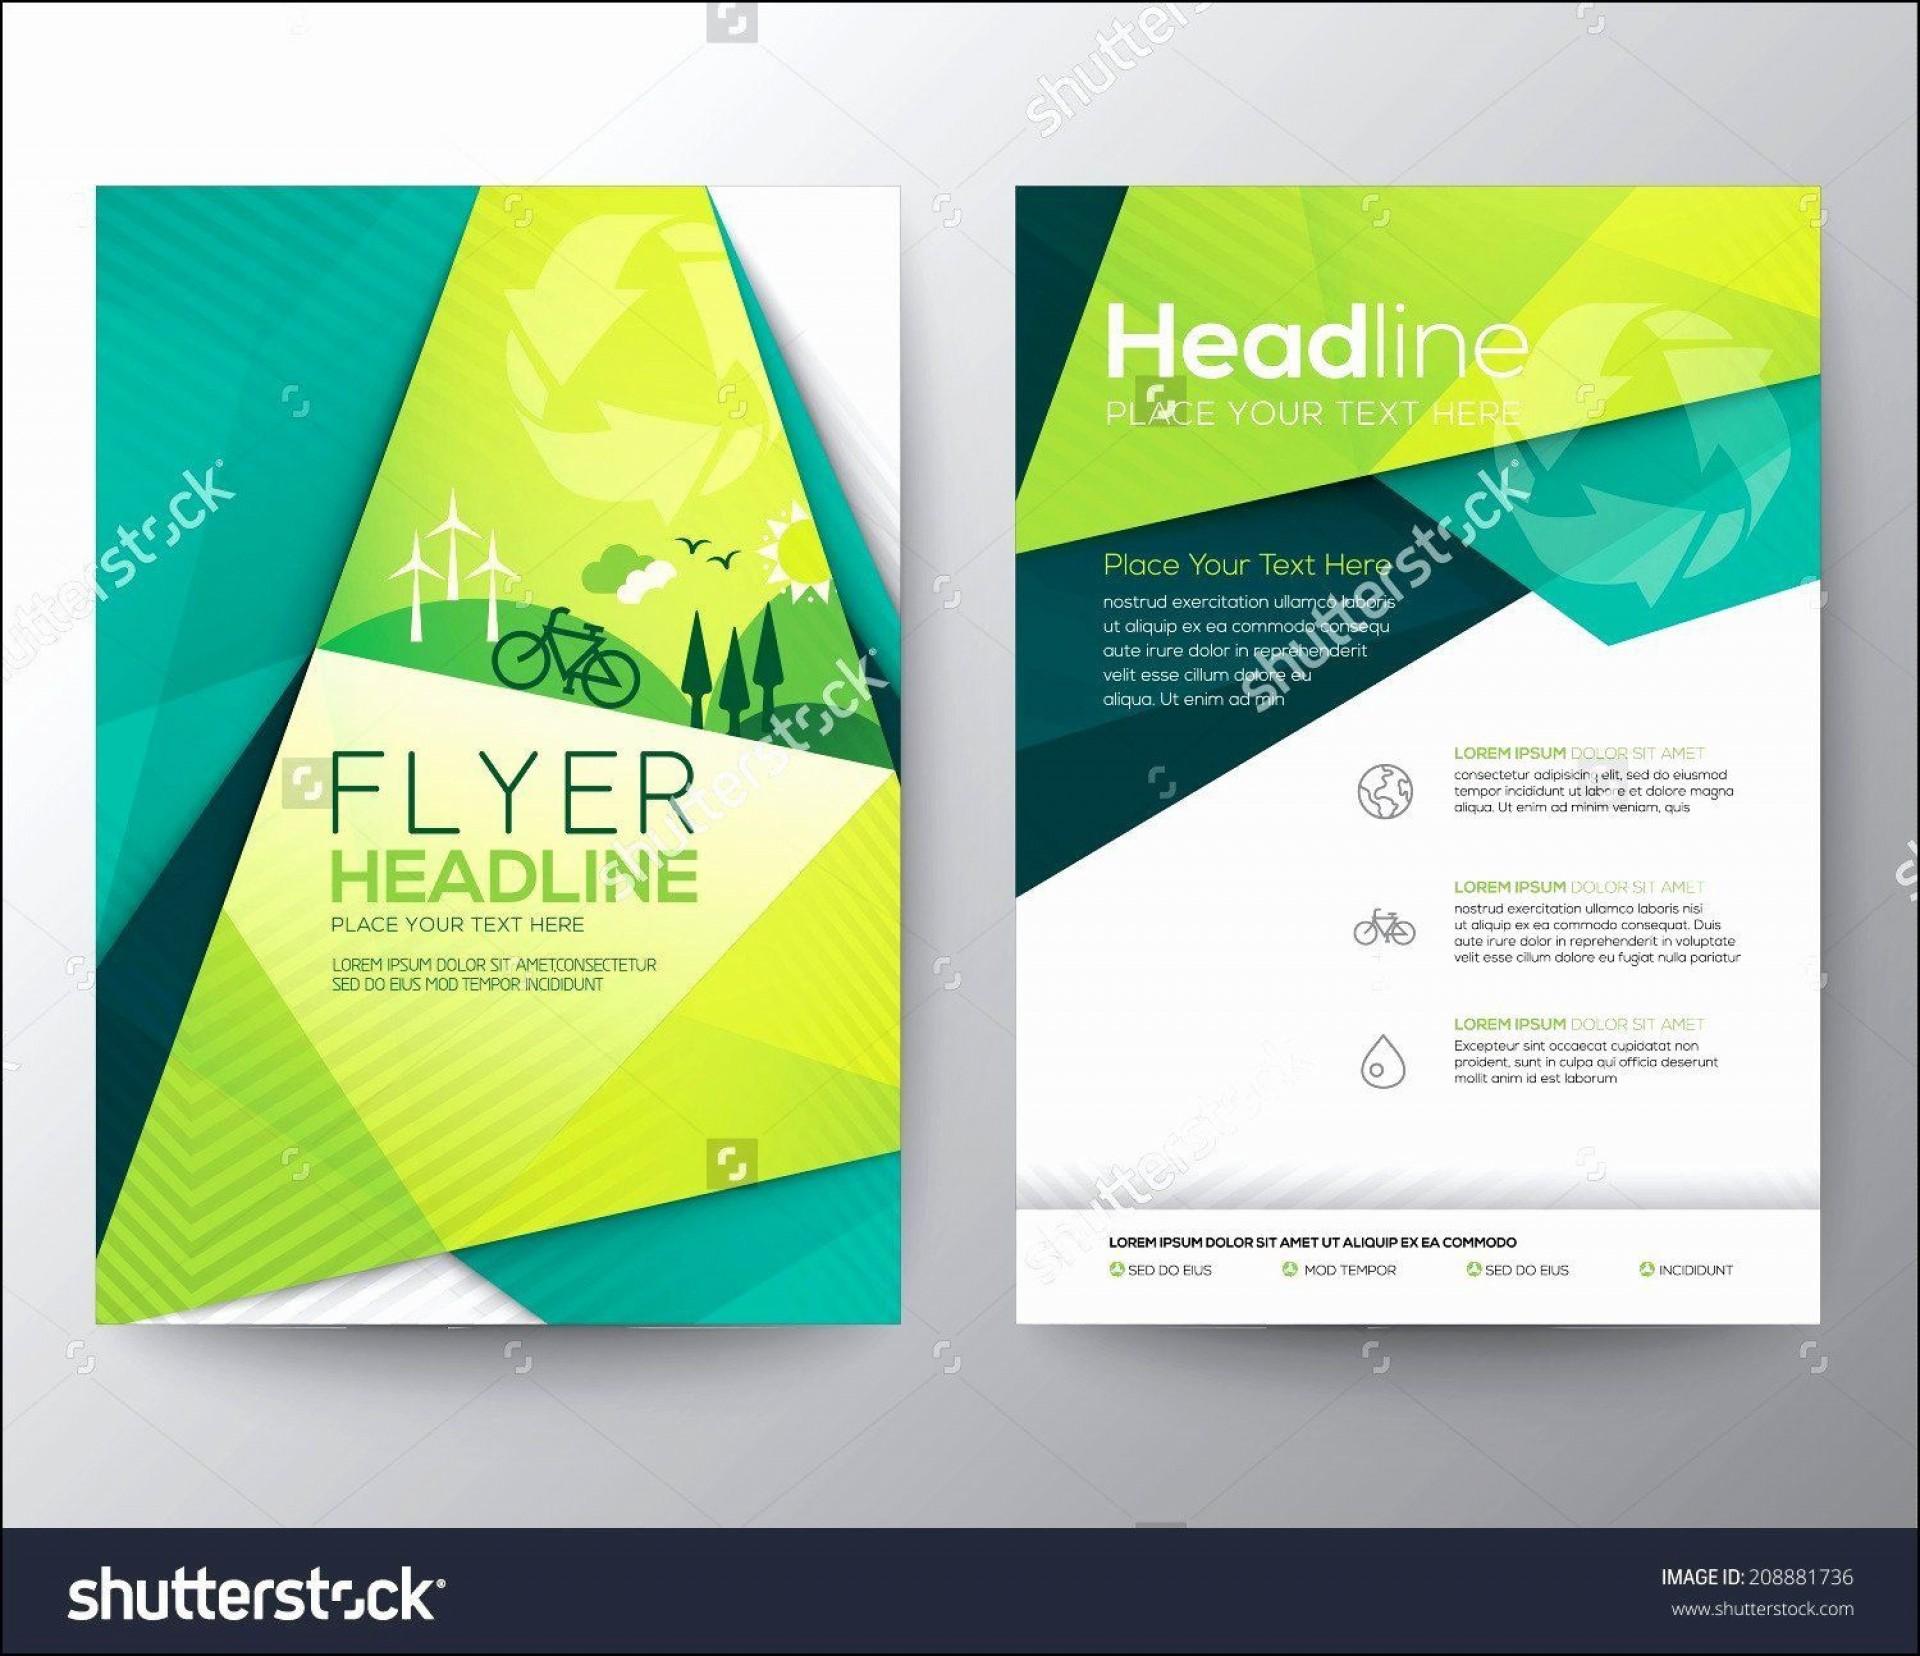 001 Impressive Photoshop Brochure Design Template Free Download Photo 1920